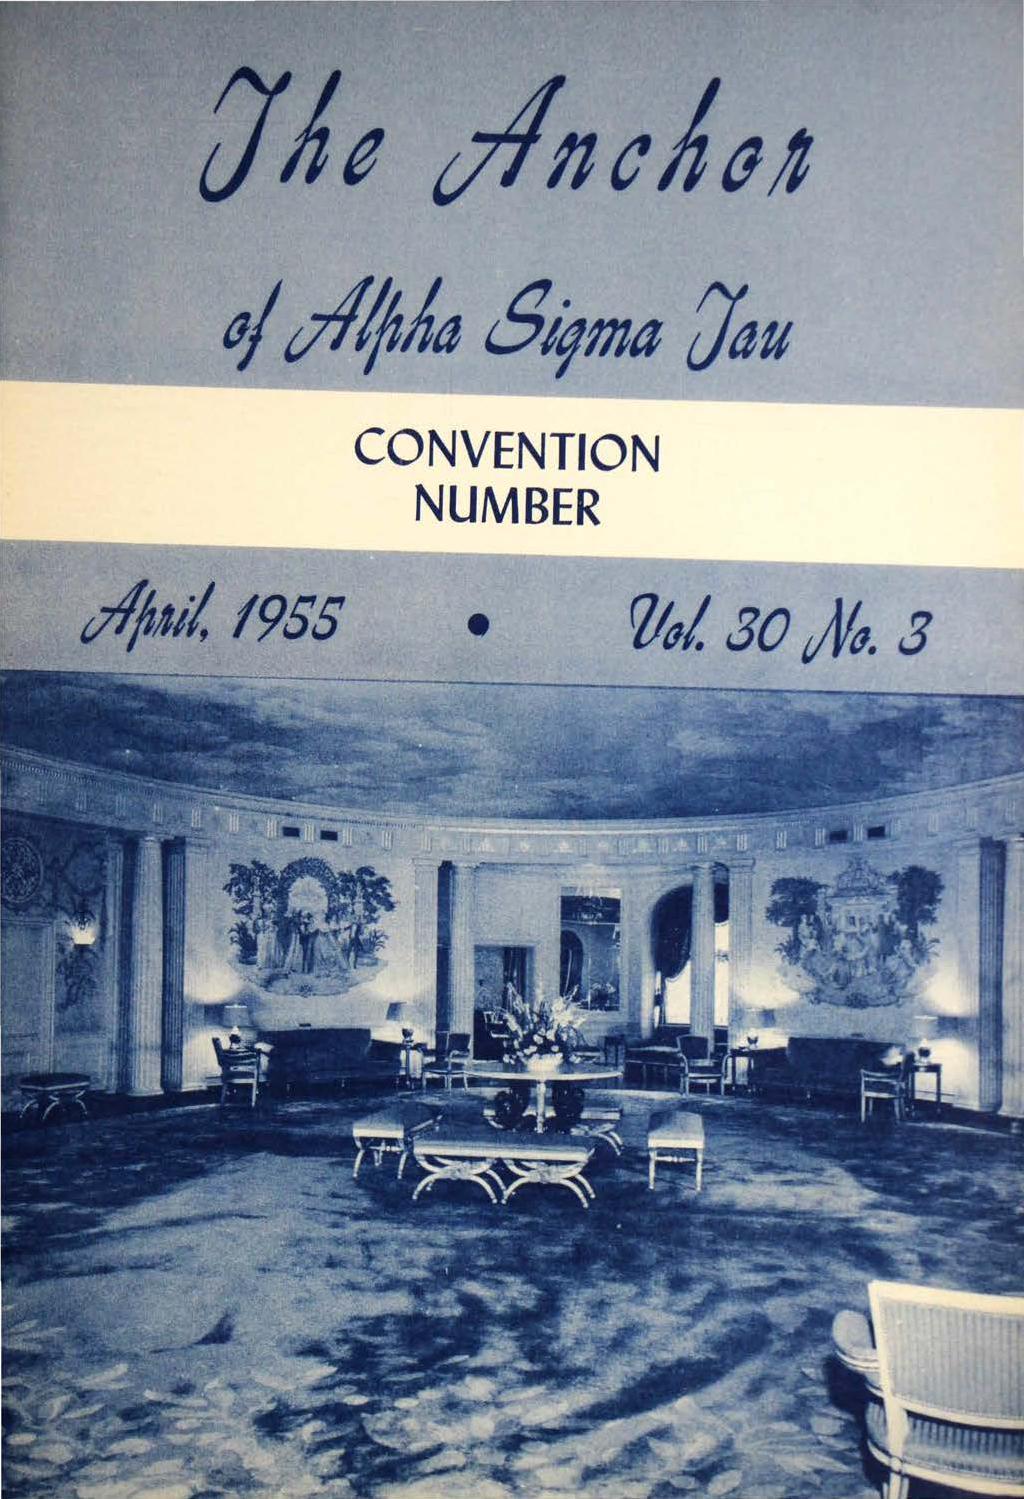 1955 April ANCHOR by Alpha Sigma Tau National Sorority - issuu